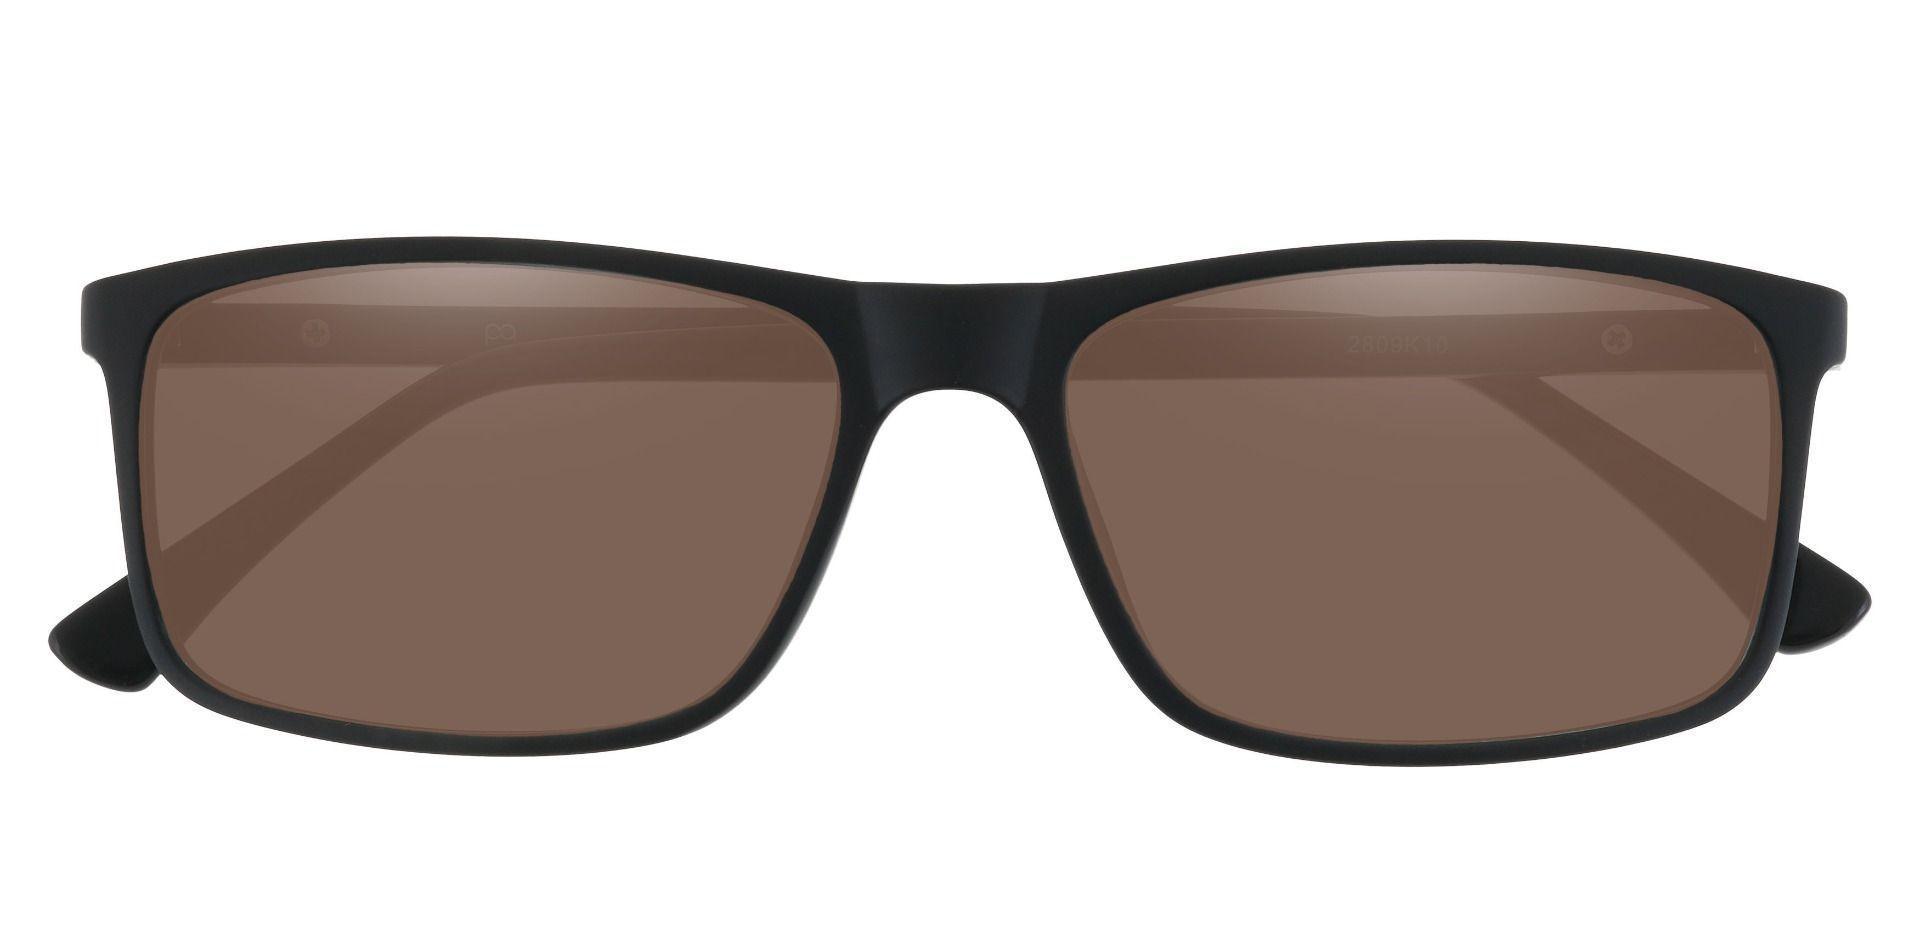 Montana Rectangle Prescription Sunglasses - Black Frame With Brown Lenses